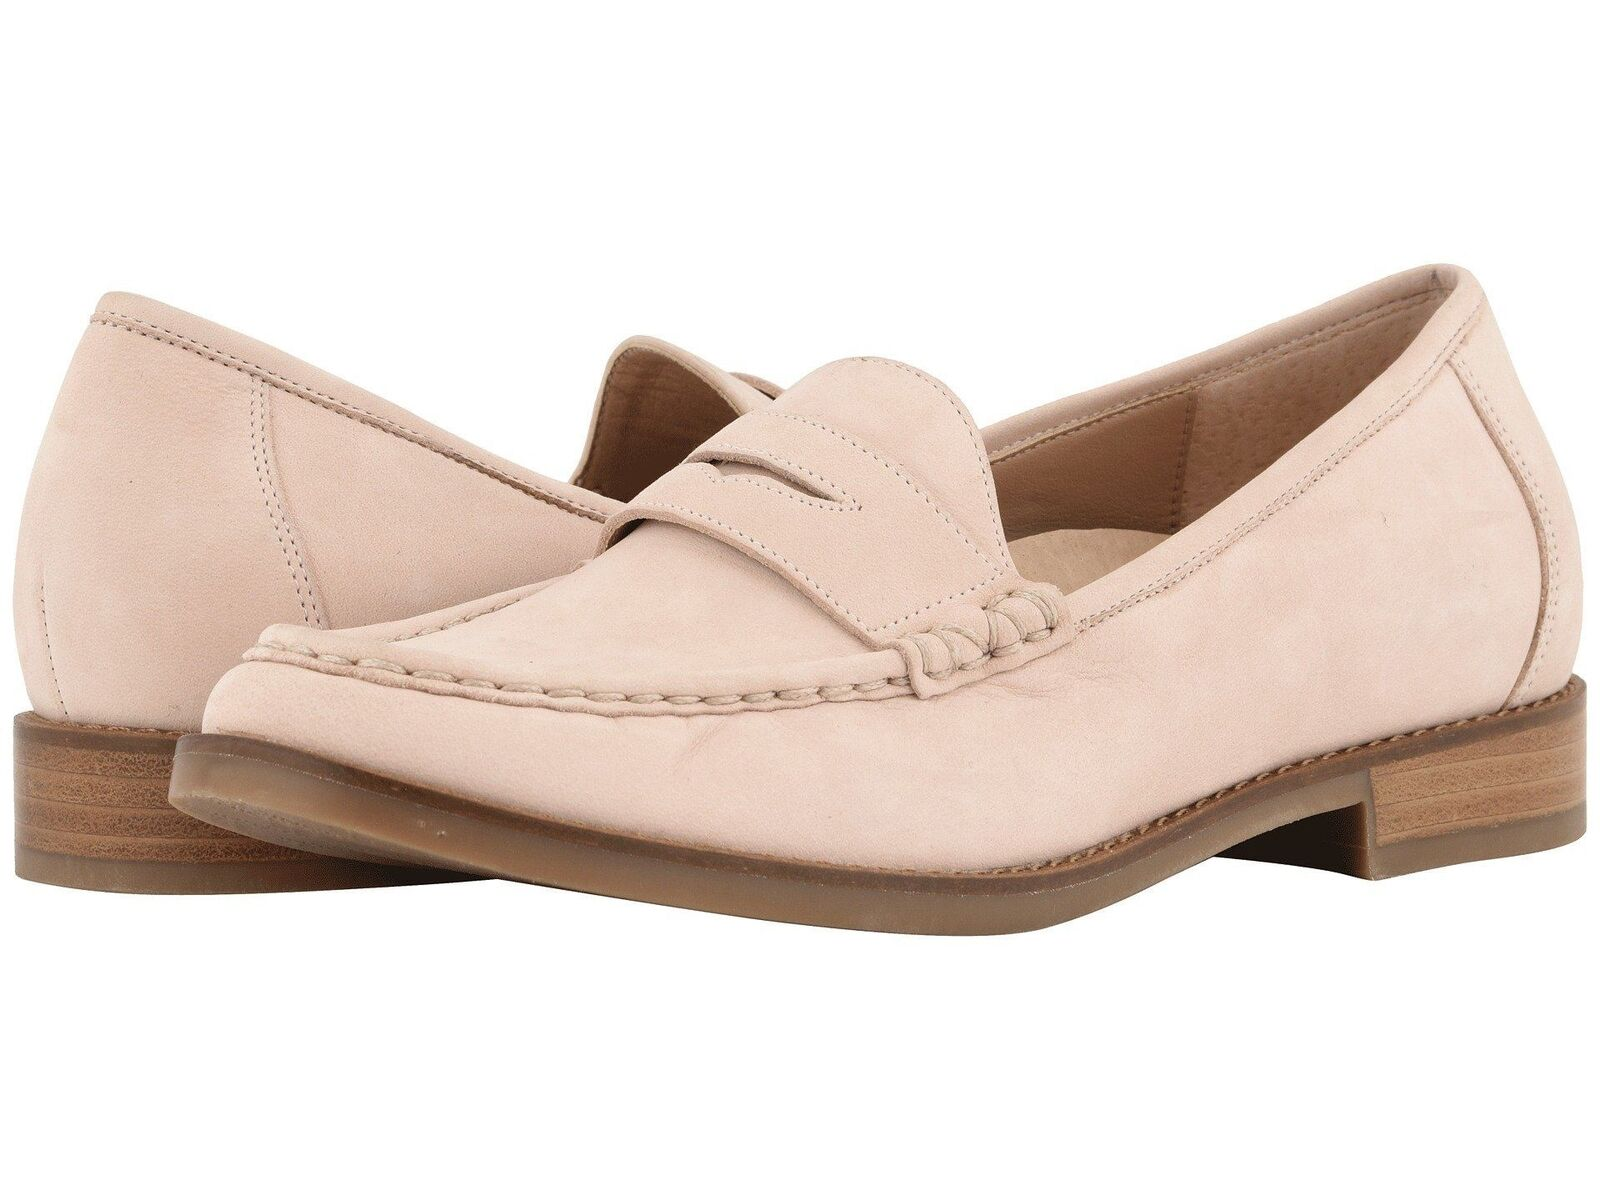 Vionic Waverly Luz rosado Zapatos para mujer de moda moda moda  muy popular